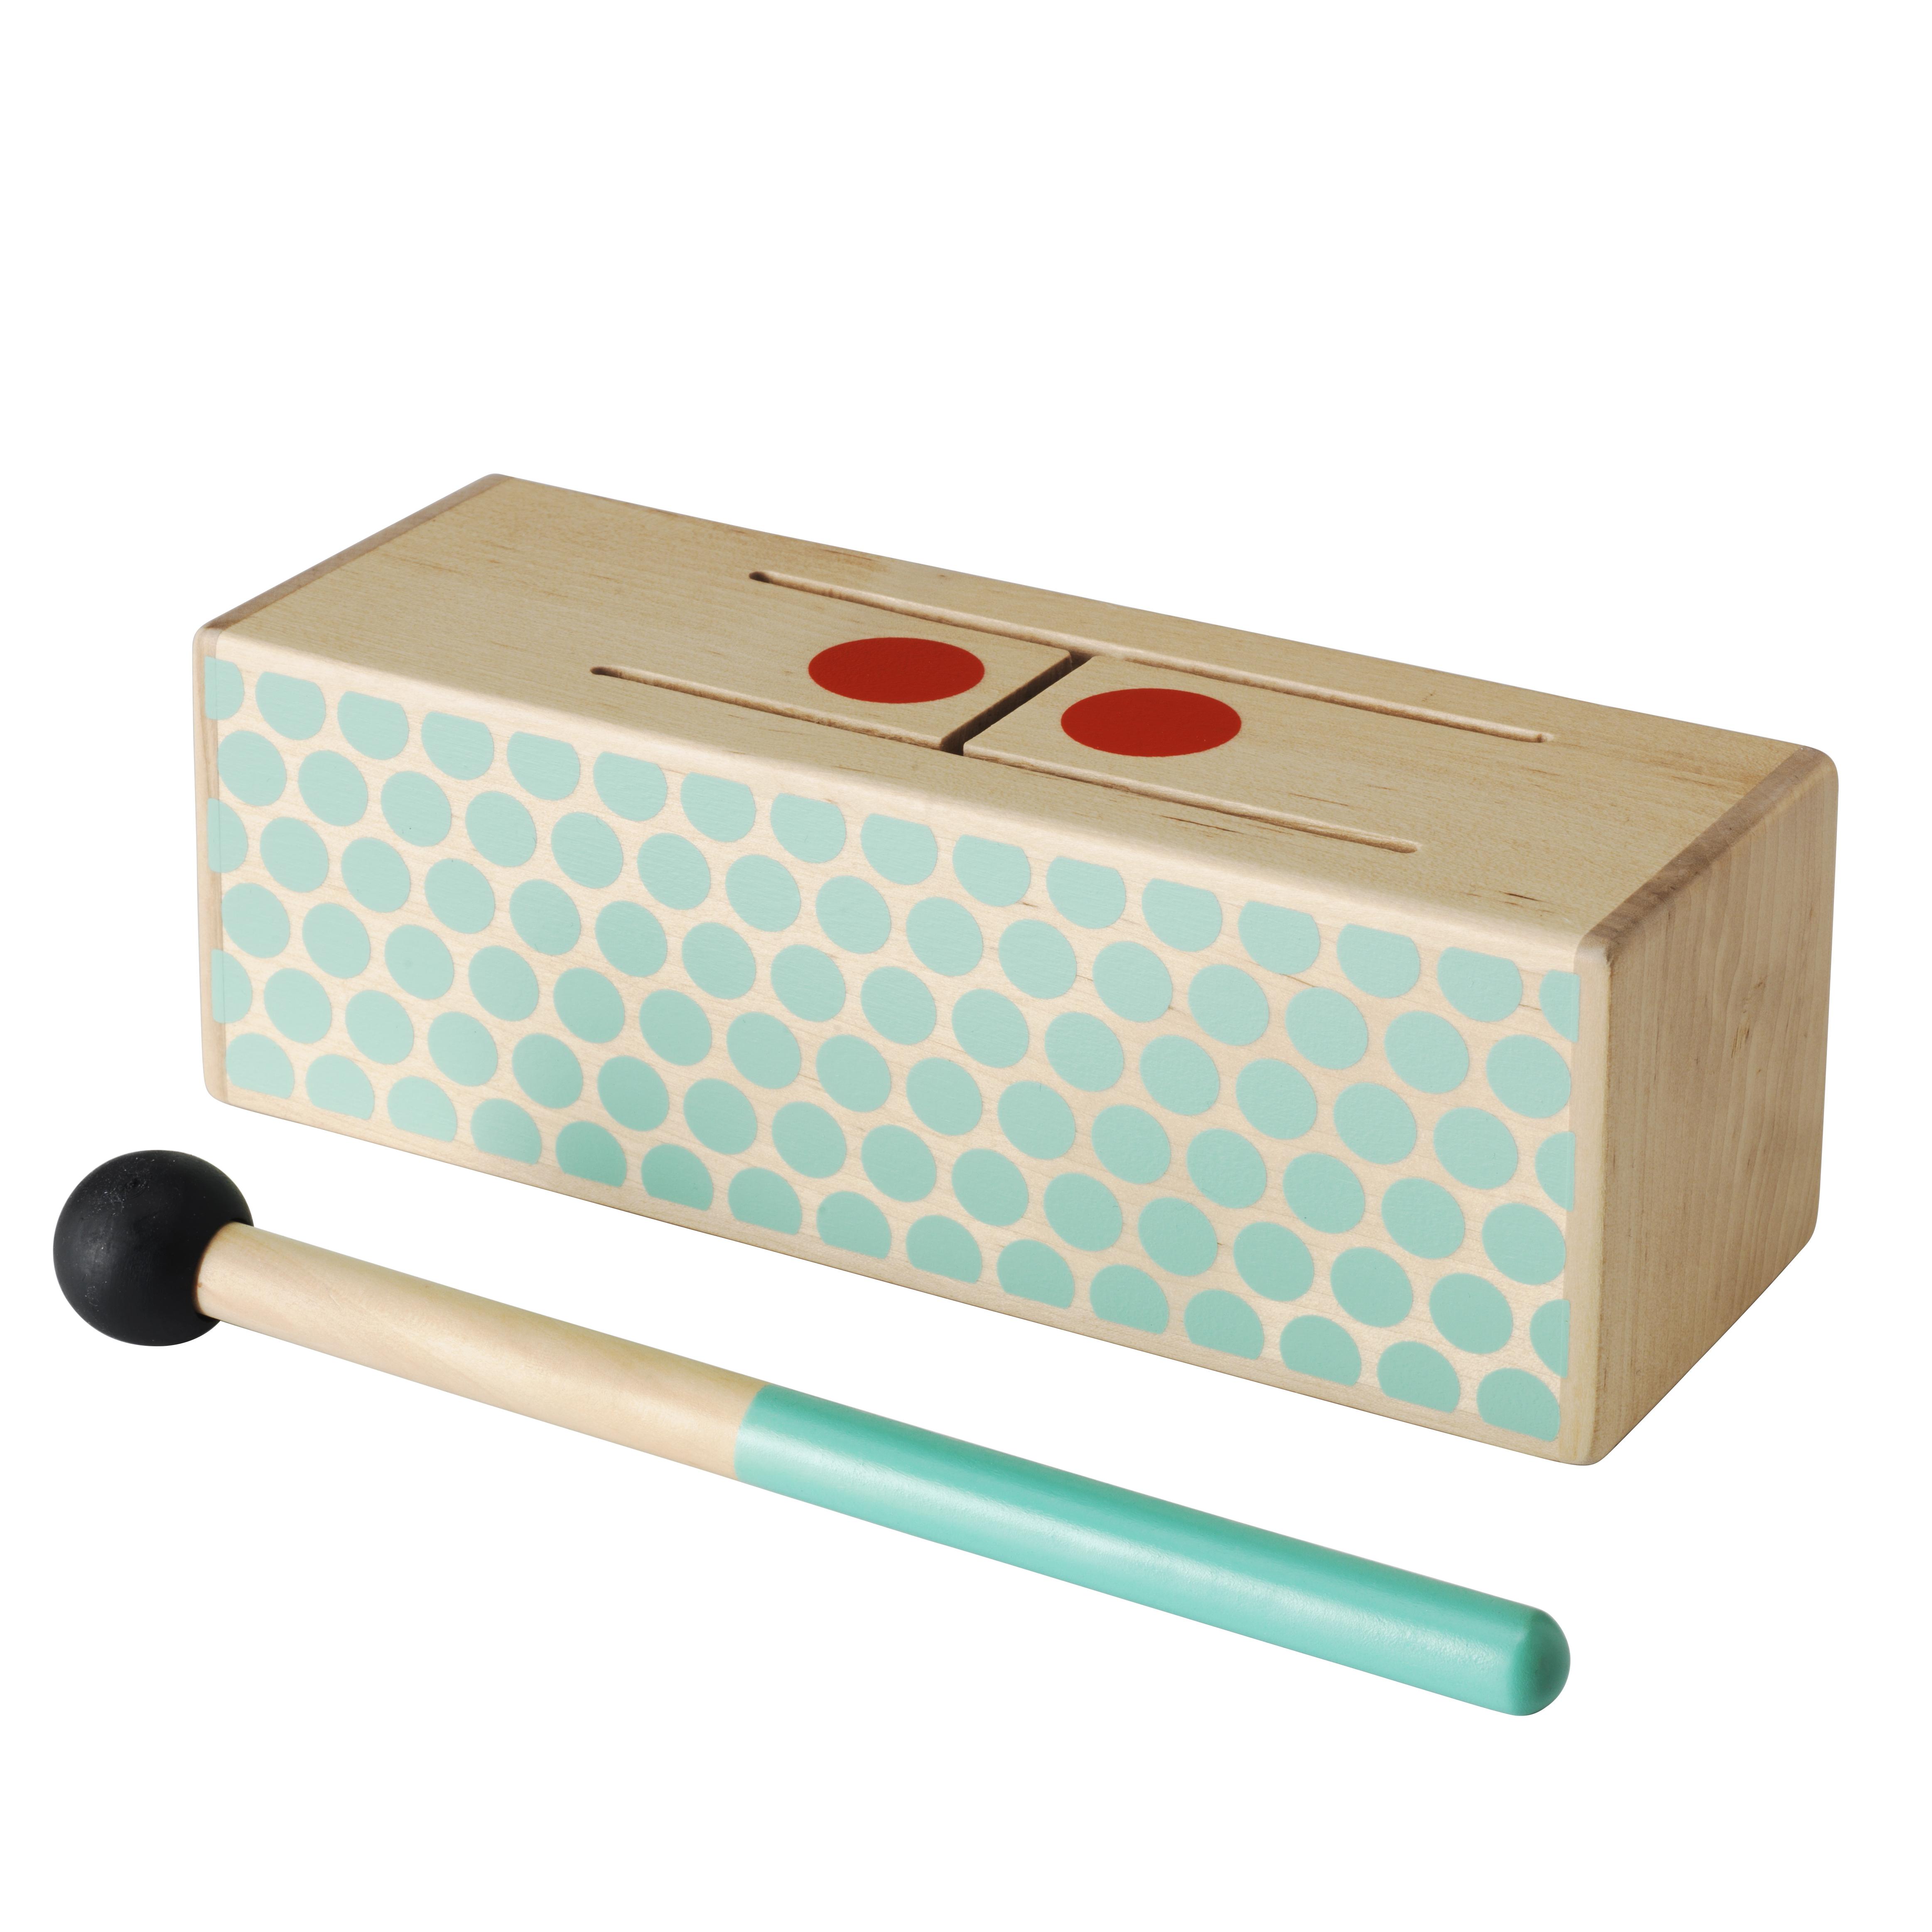 ikea ruft vorsorglich lattjo trommelschl gel und lattjo schlaginstrument wegen. Black Bedroom Furniture Sets. Home Design Ideas